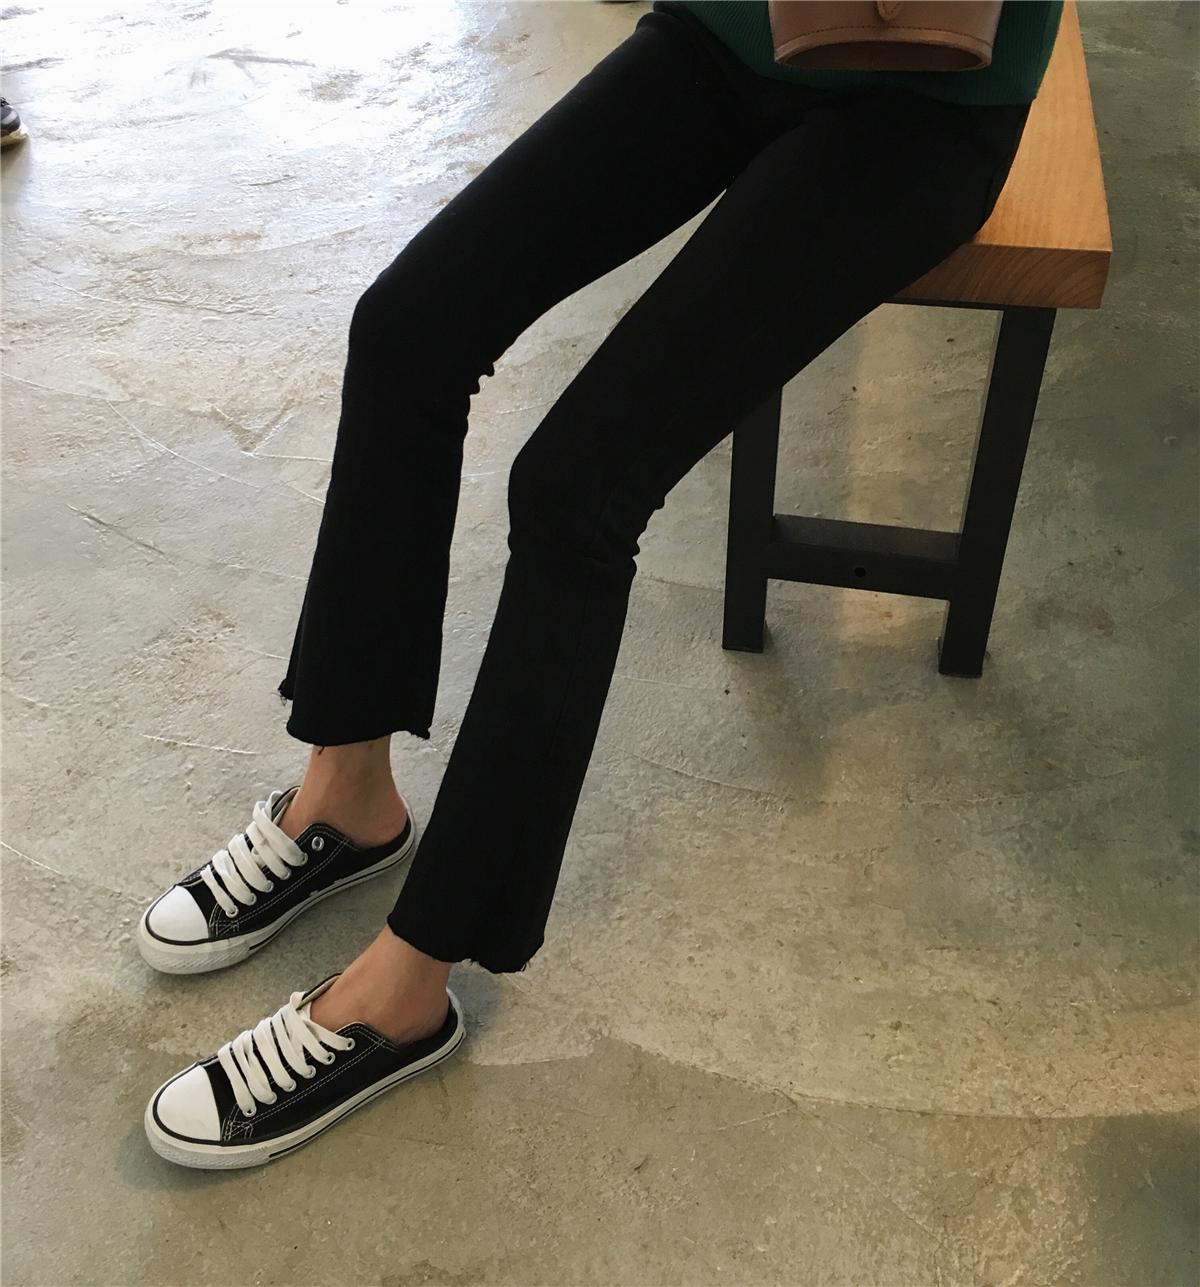 DUTE 秋季韩版女装新款chci微喇叭修身黑色打底气质深色牛仔裤女